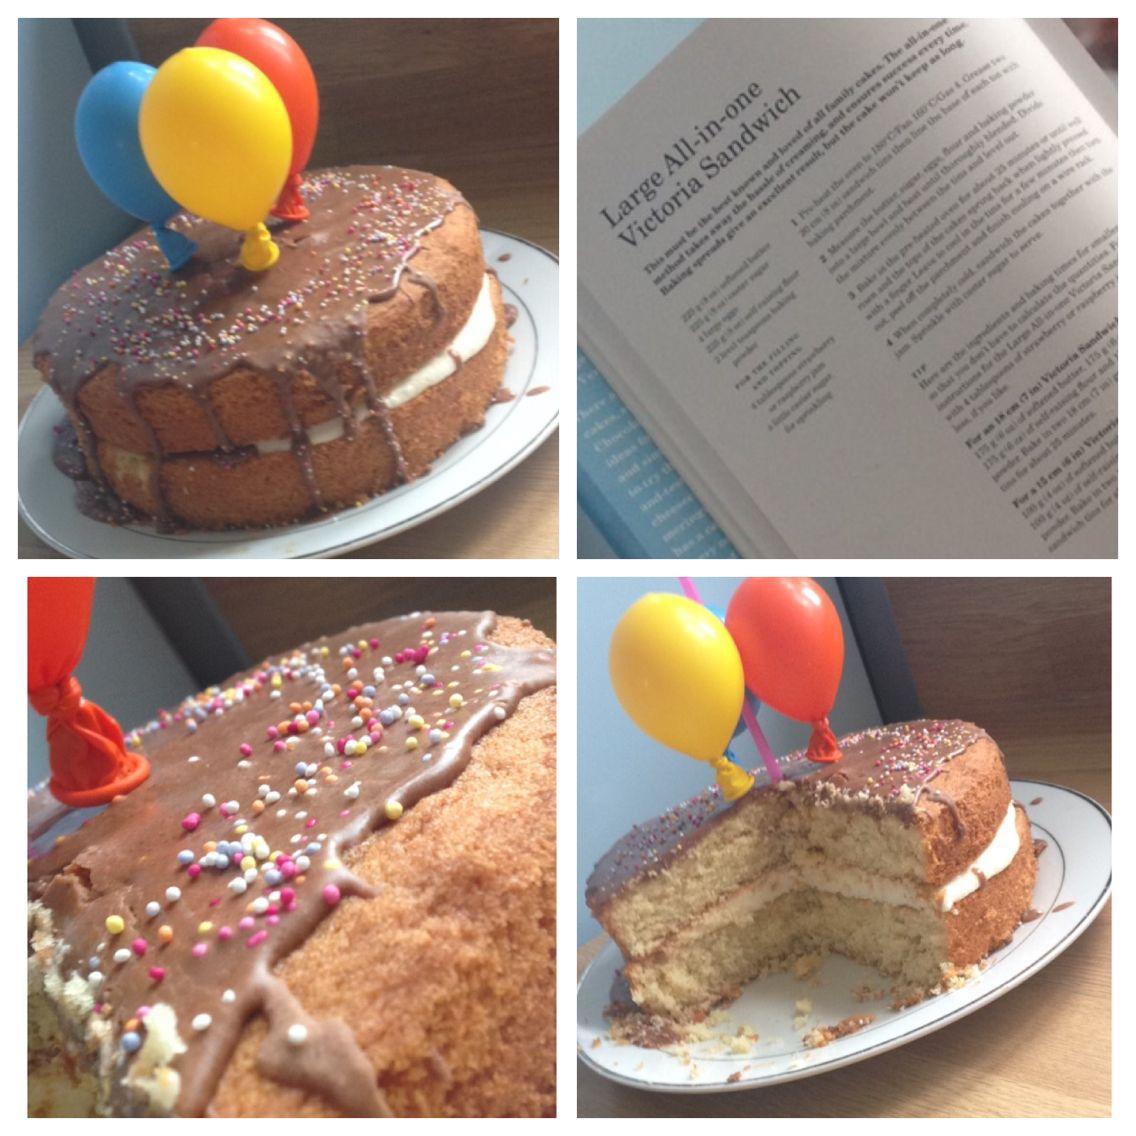 Made Mums Birthday Cake Yesterday Using Mary Berrys Victoria